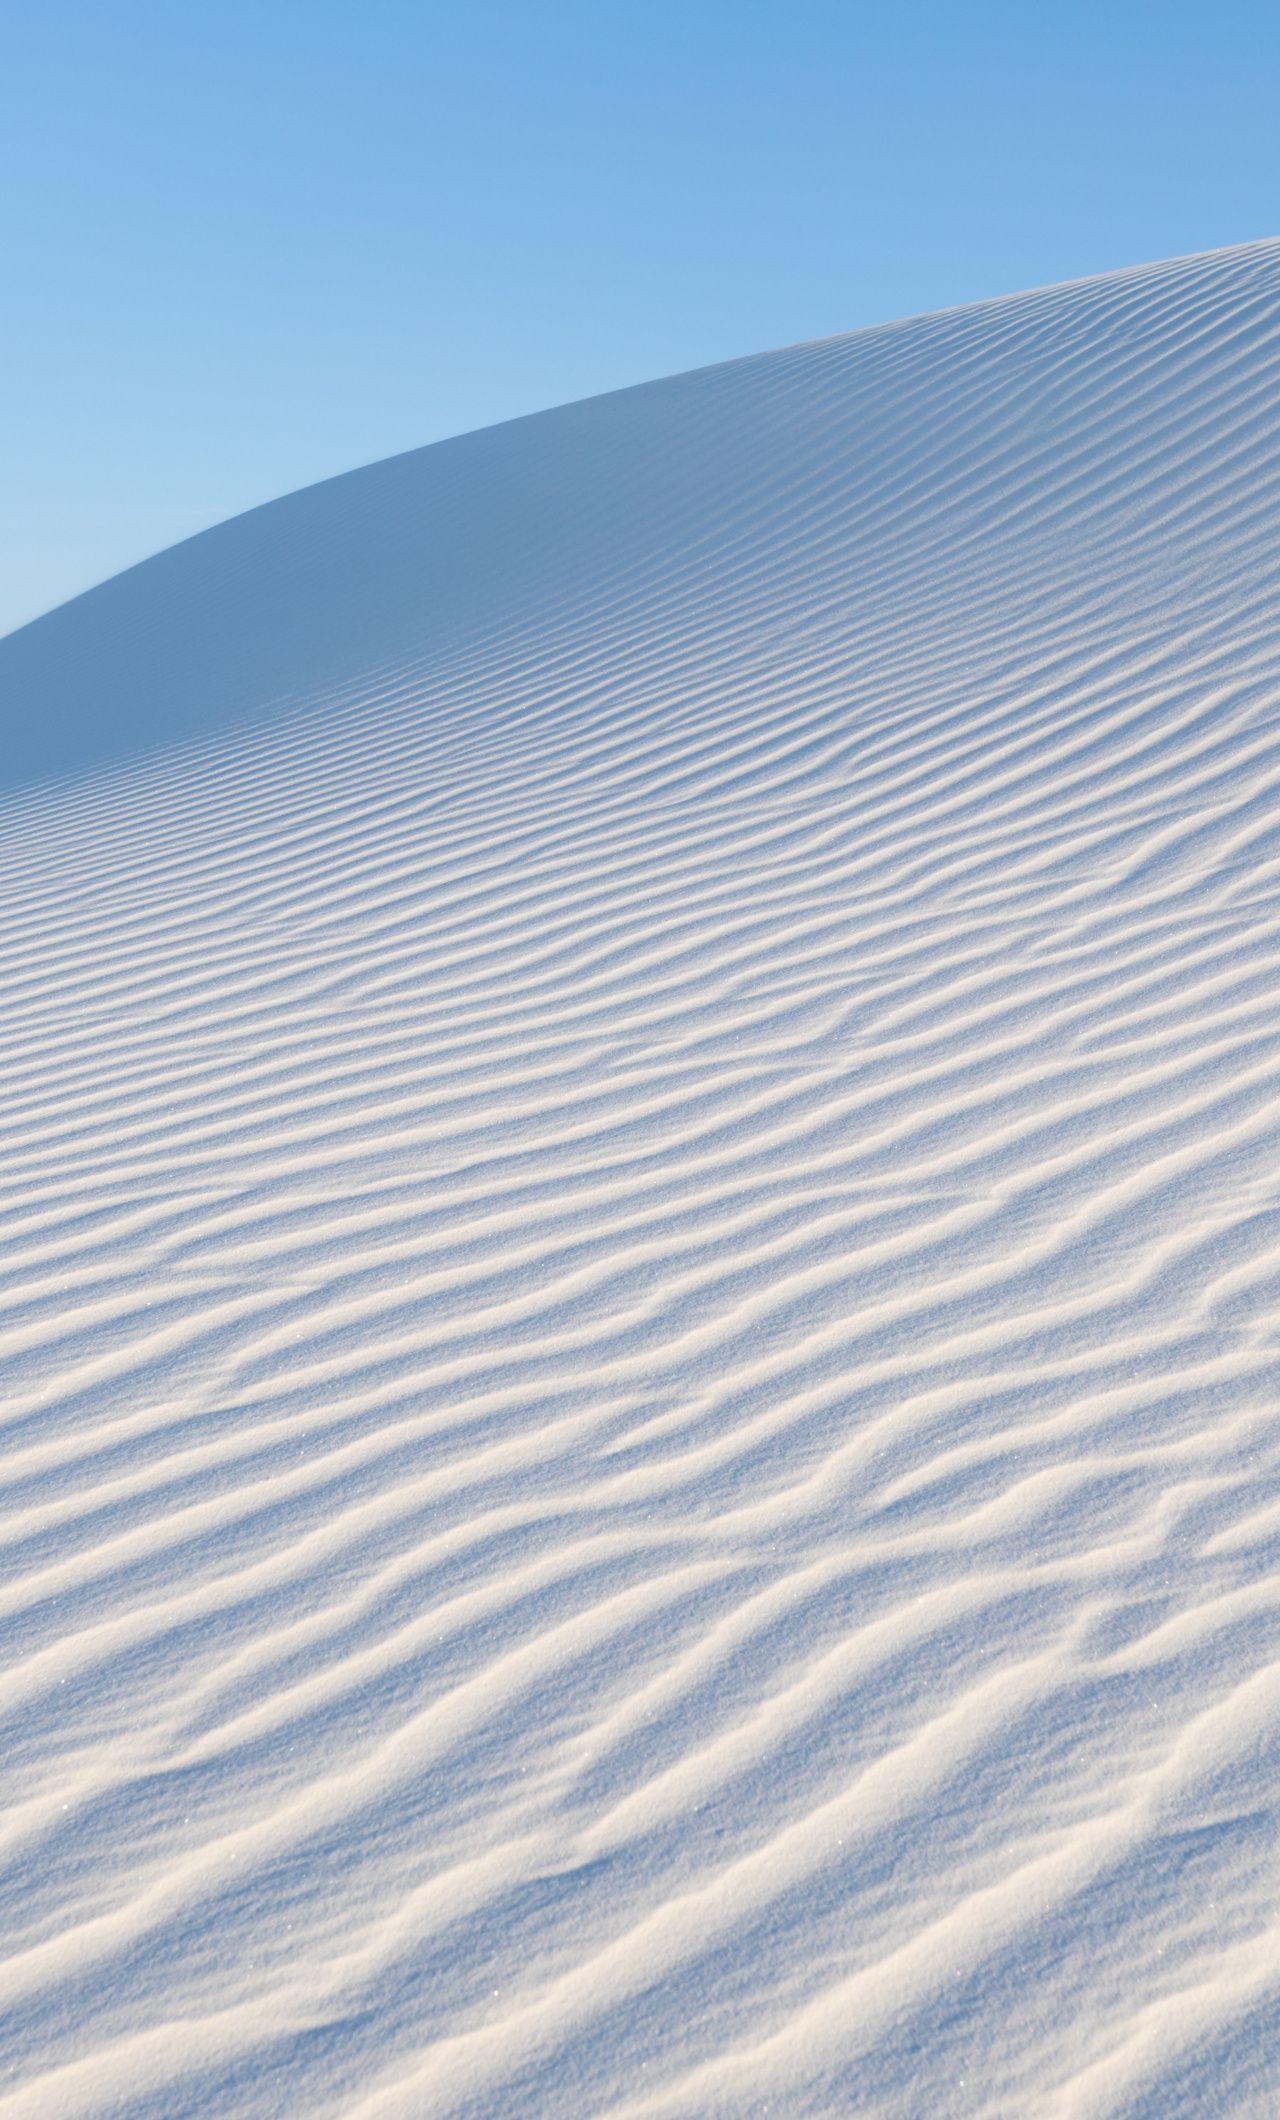 White Sand Desert Nature Texture Landscape 1280x2120 Wallpaper Wallpaper Free Hd Wallpapers Beautiful Wallpapers